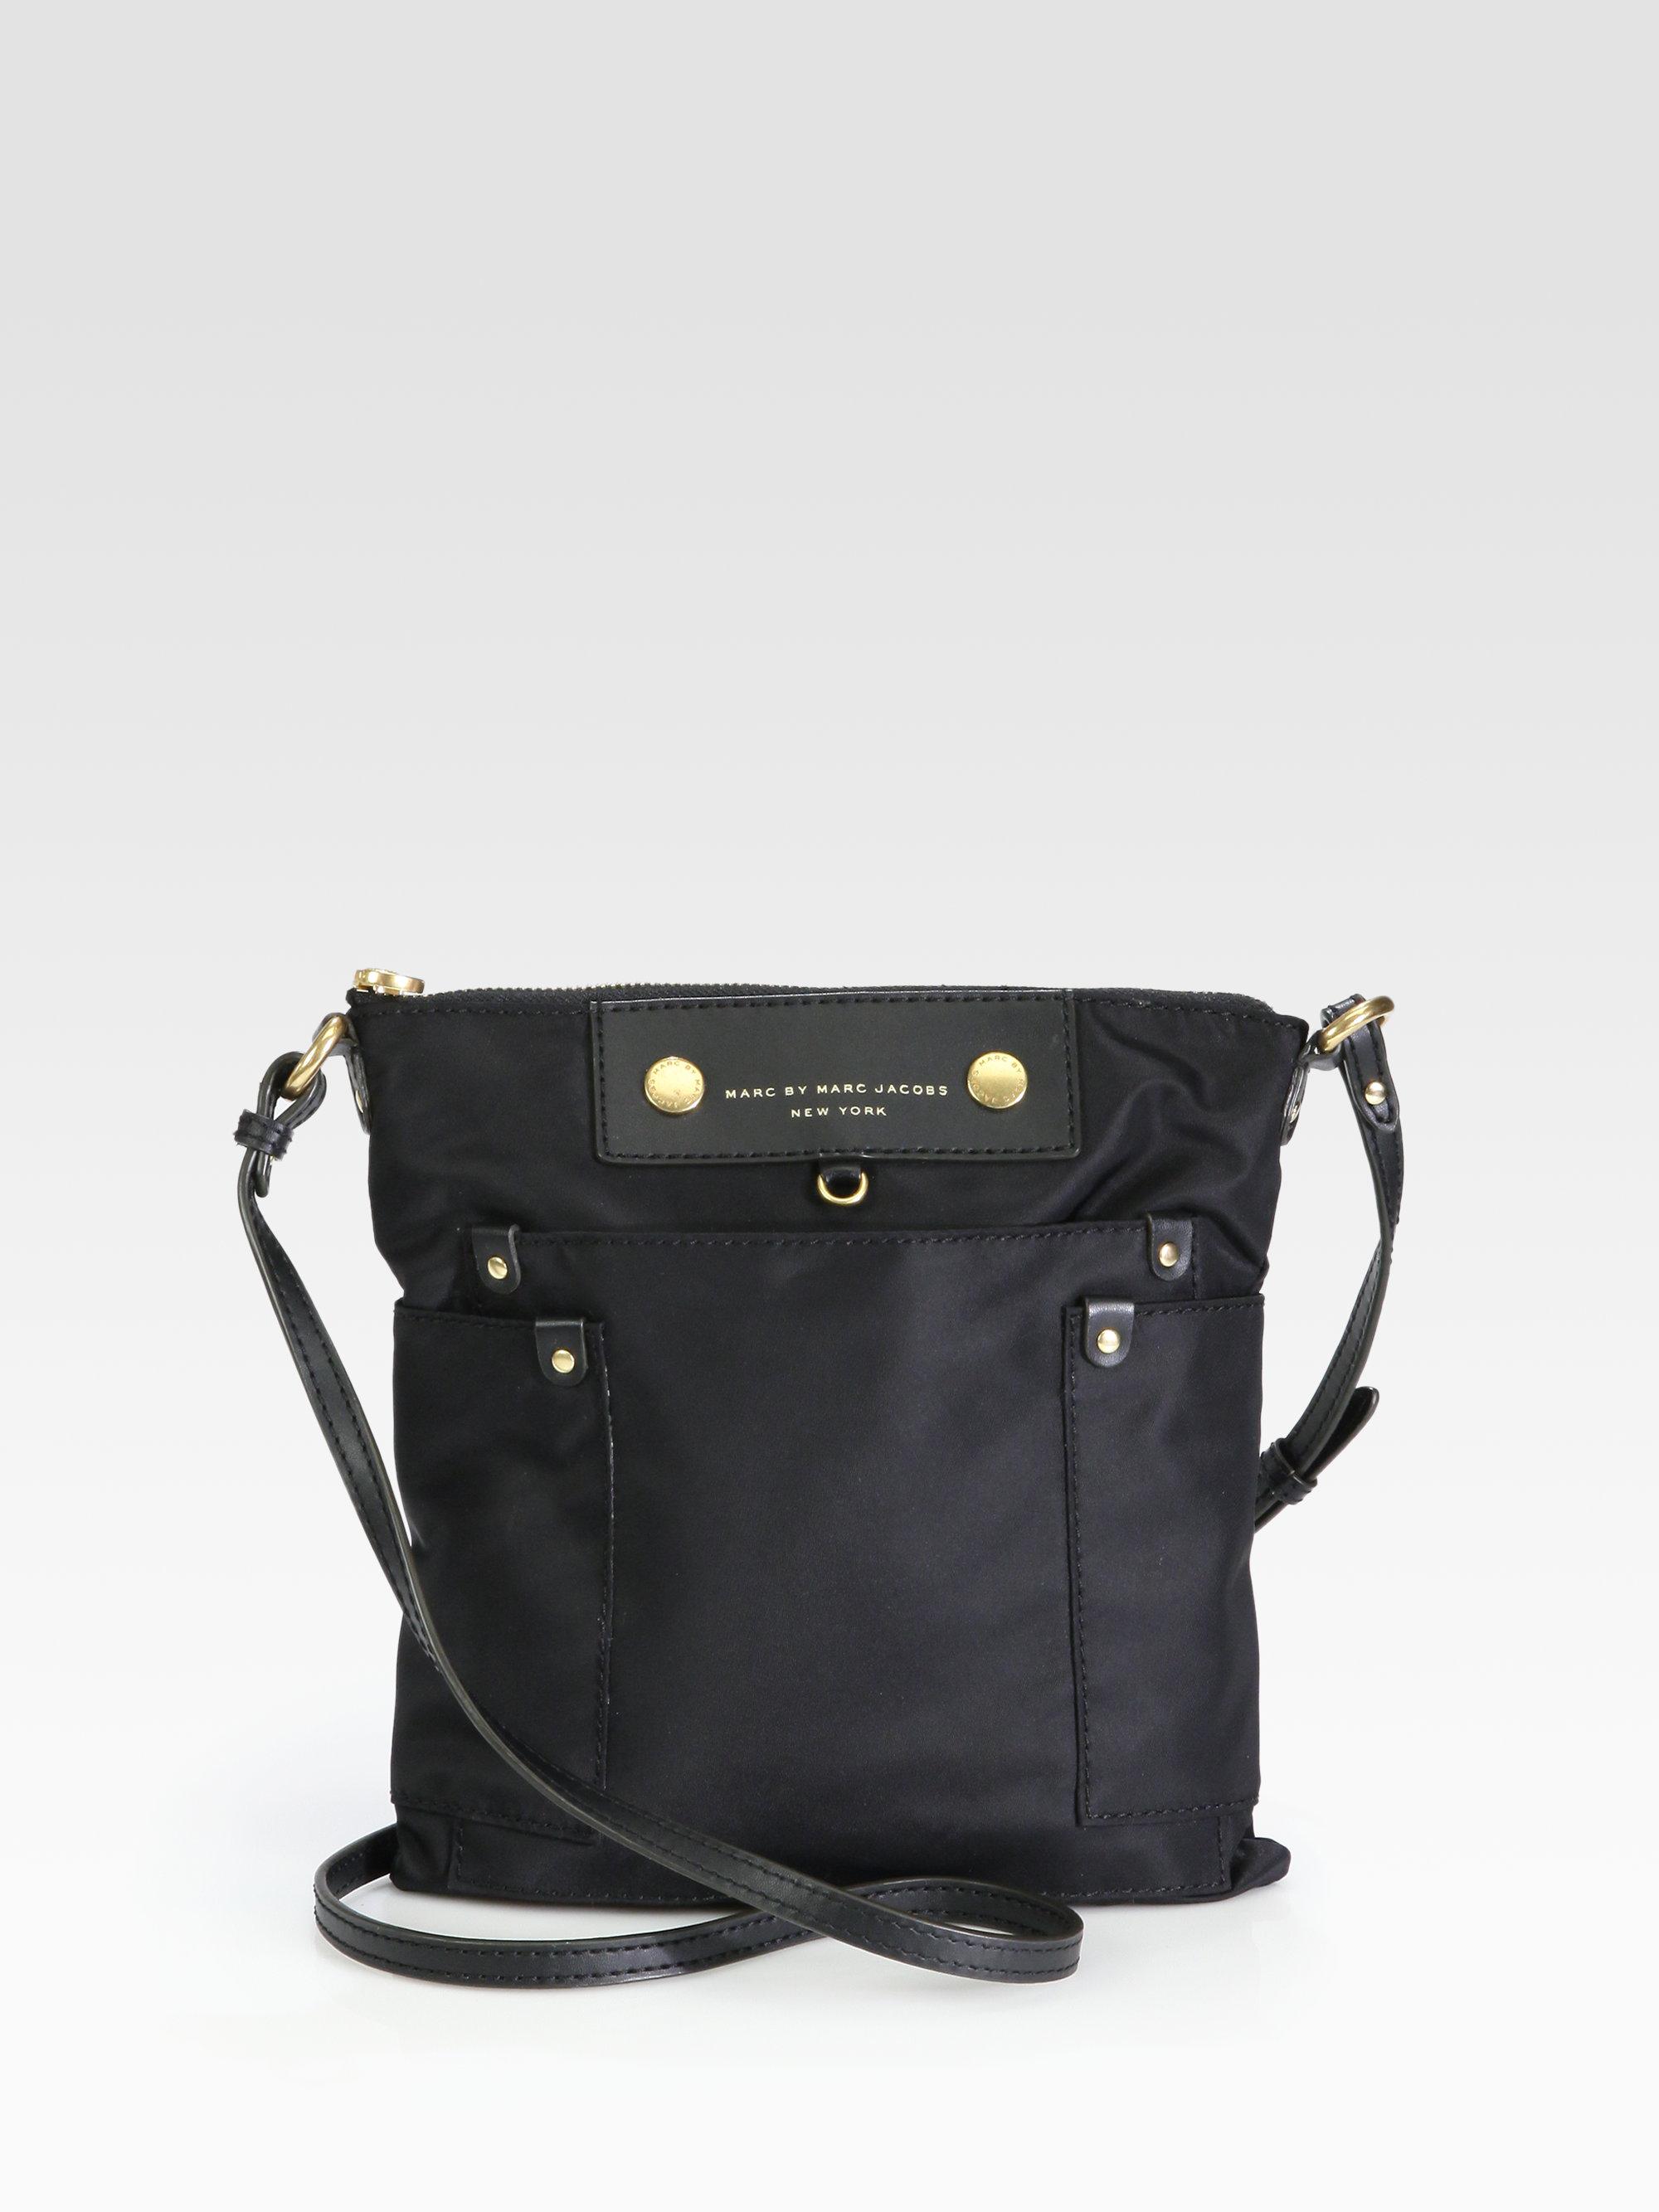 648487d14b4f Lyst - Marc By Marc Jacobs Preppy Nylon Sia Crossbody Bag in Black